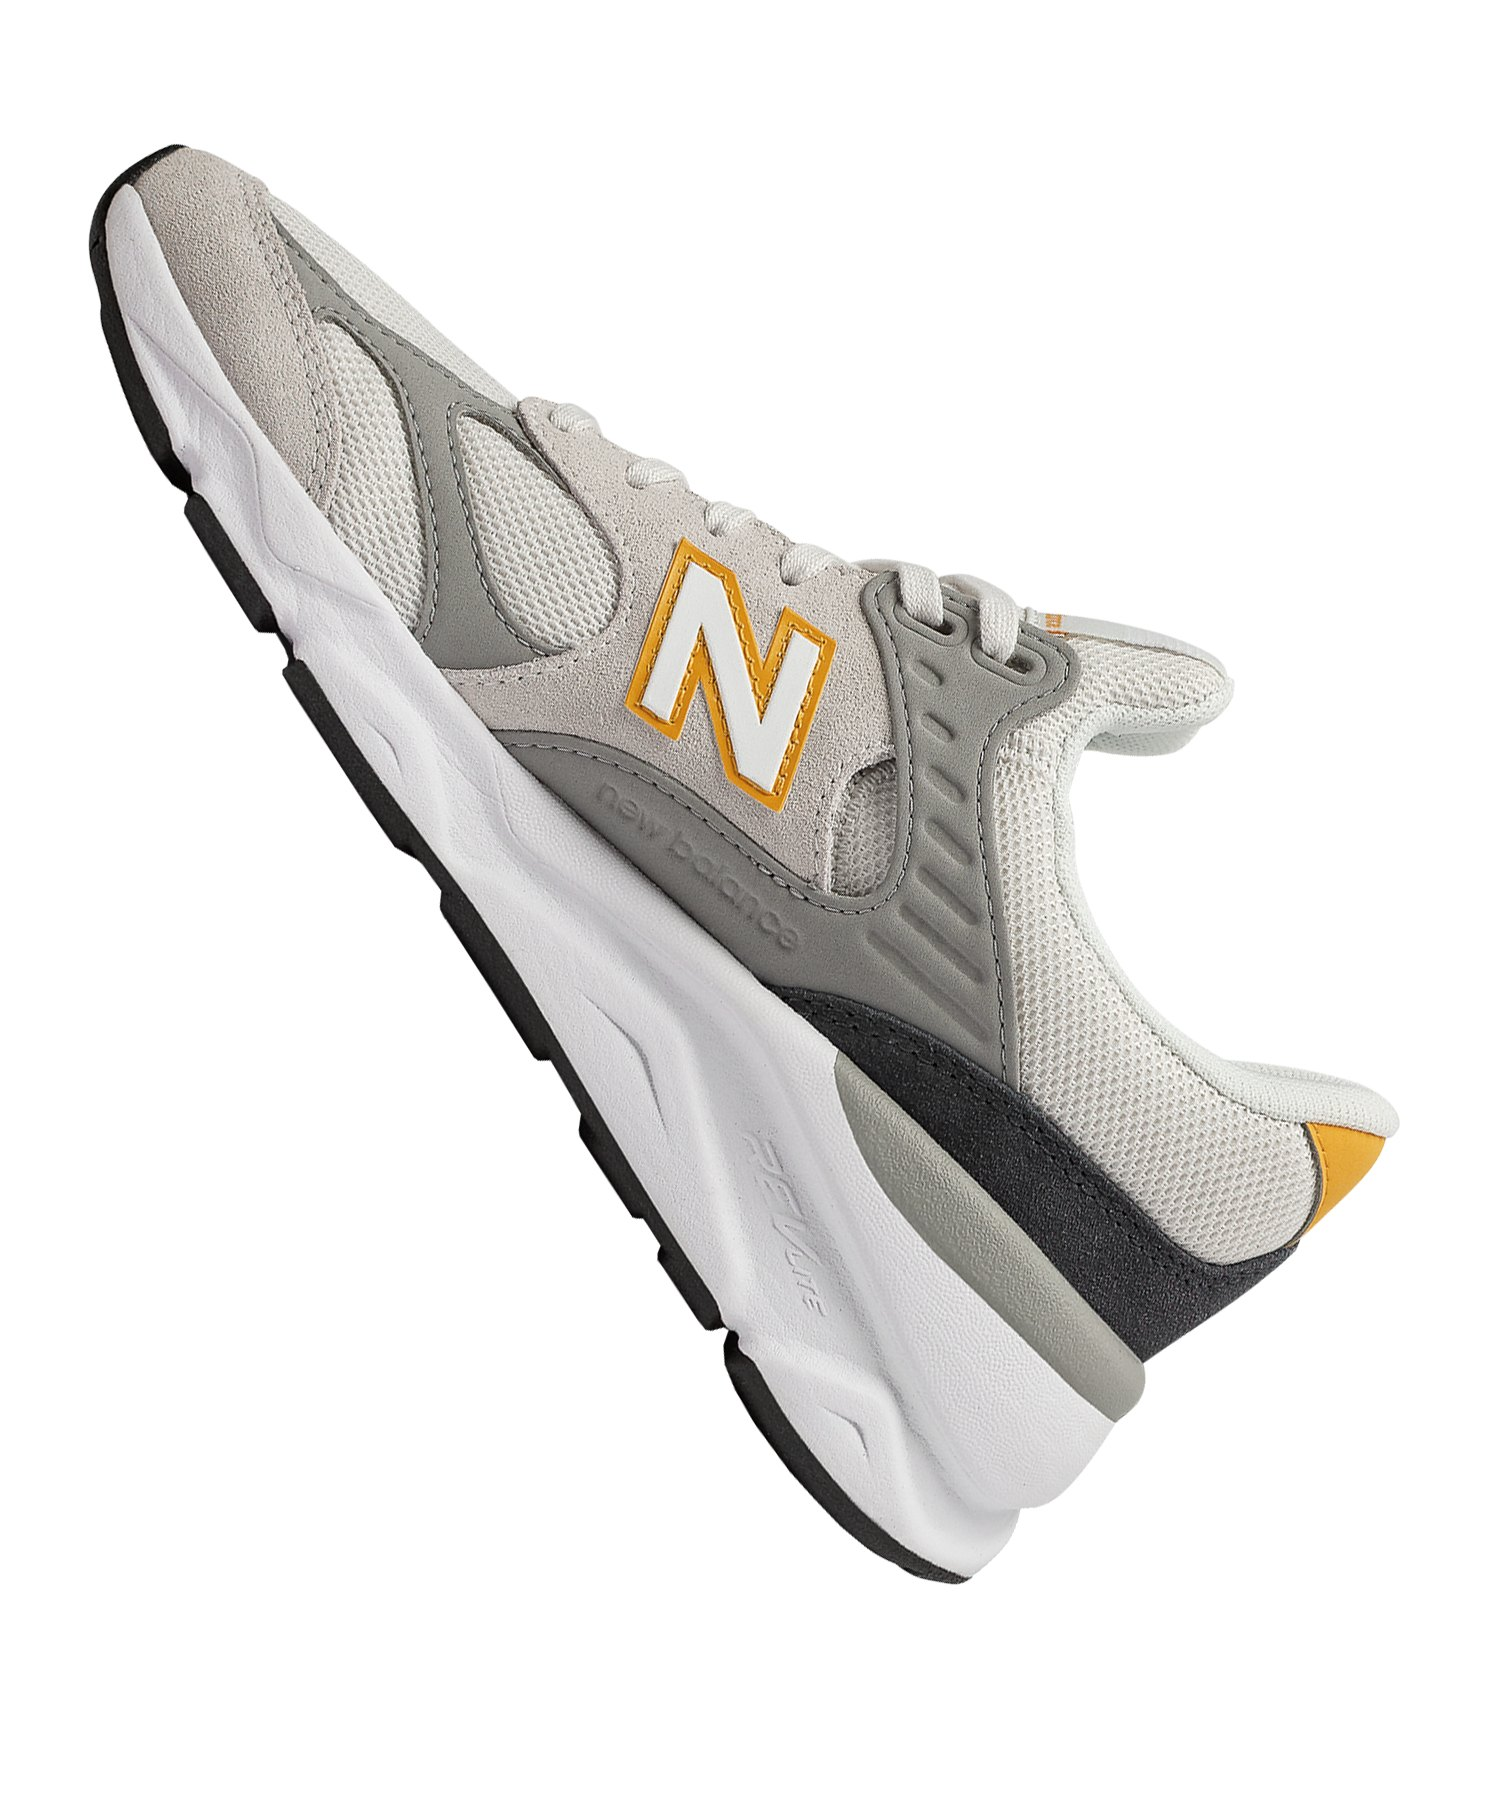 New Sneaker Reconstructed F3 Balance Damen Grau X 90 n0kXwO8P